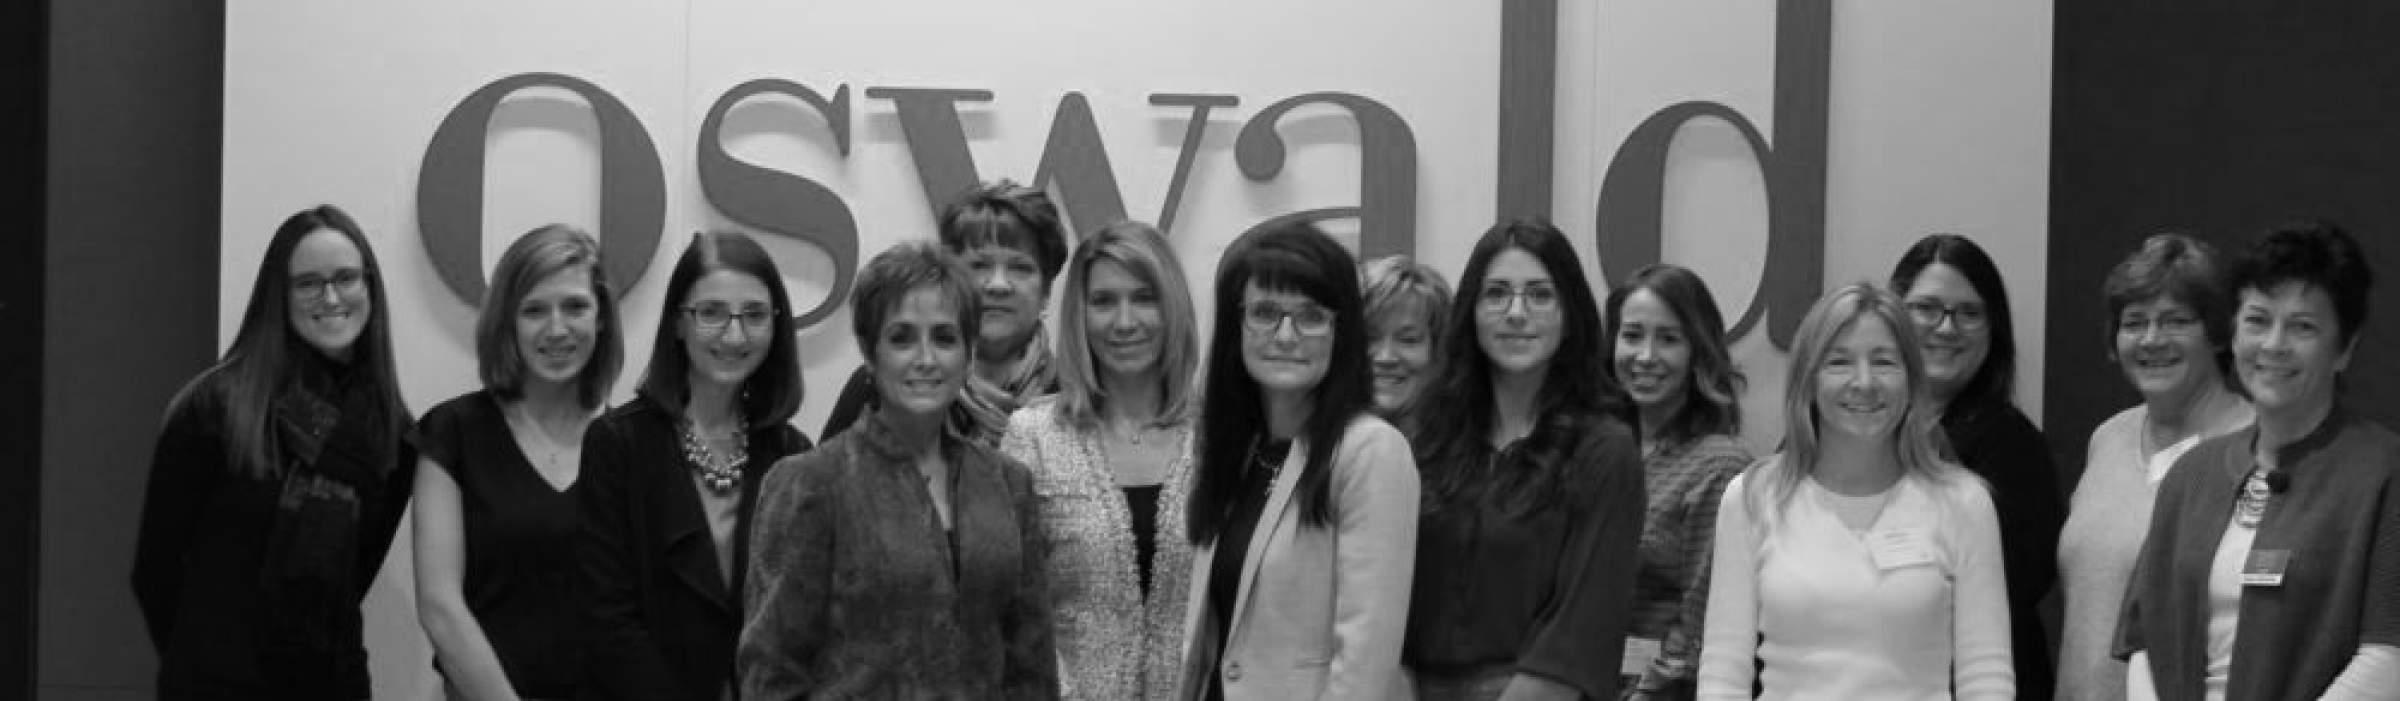 Oswald women leadership council